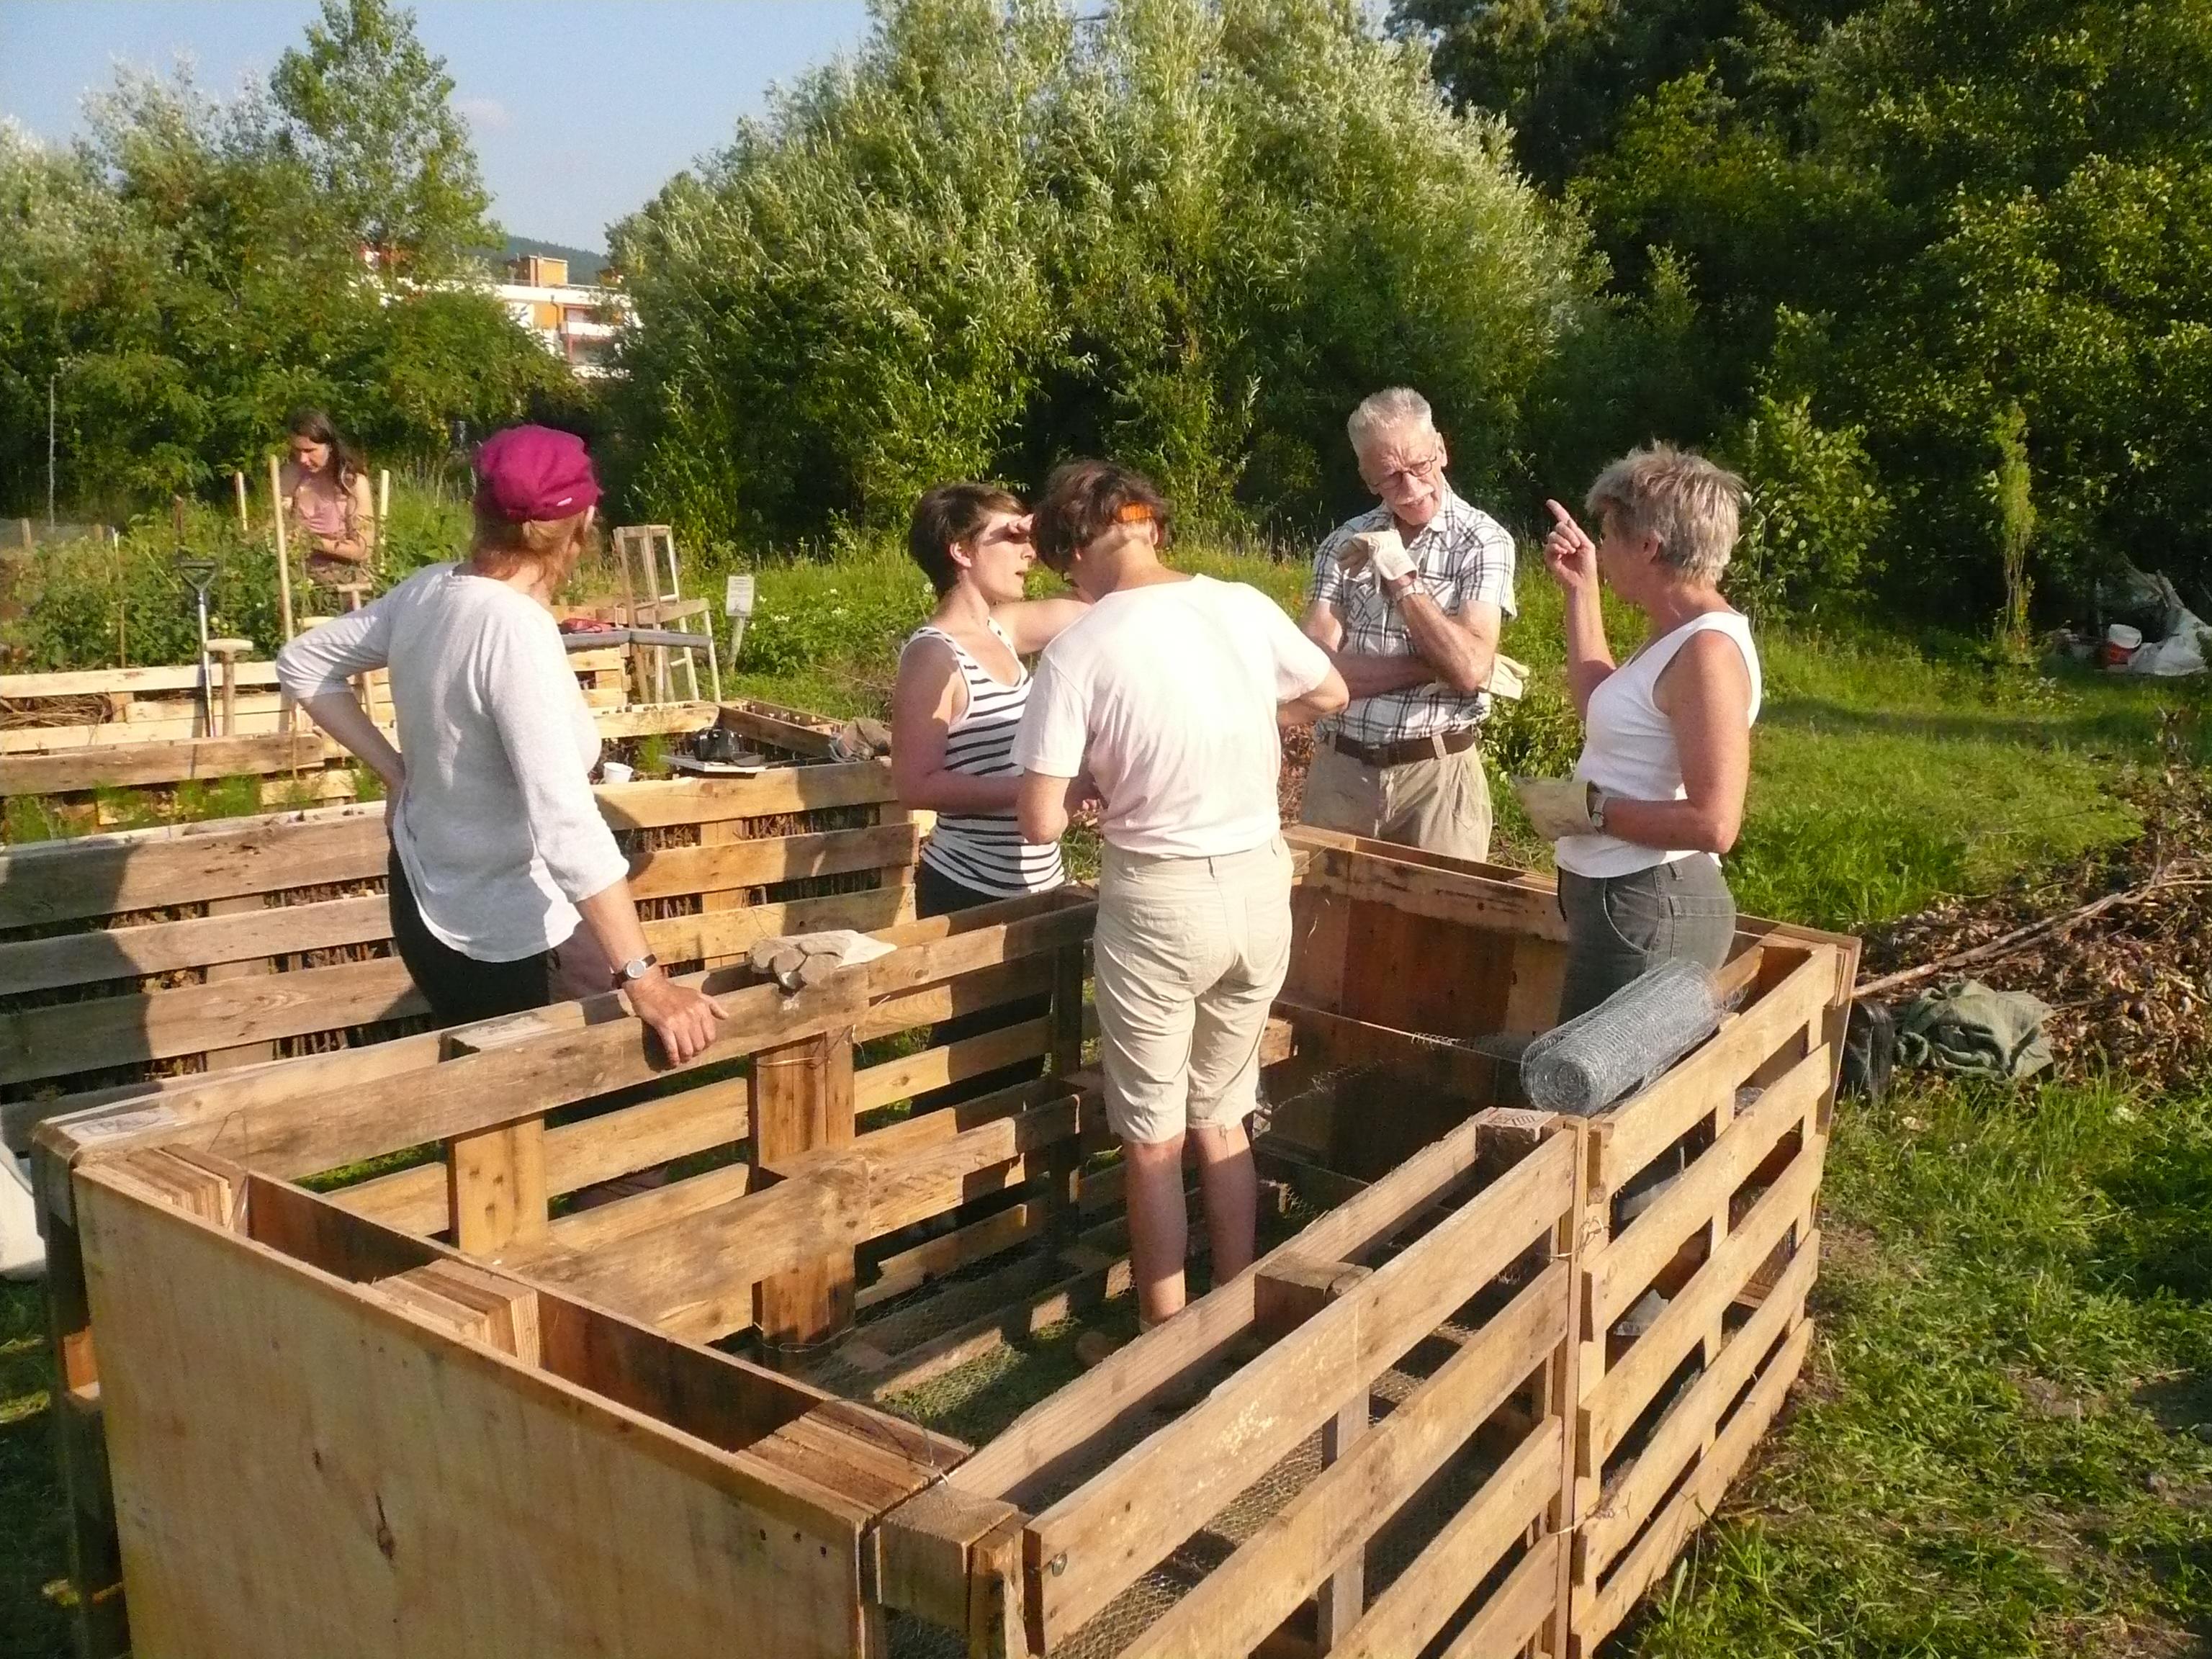 2013-07-11 Bau des 4. Hochbeets 013